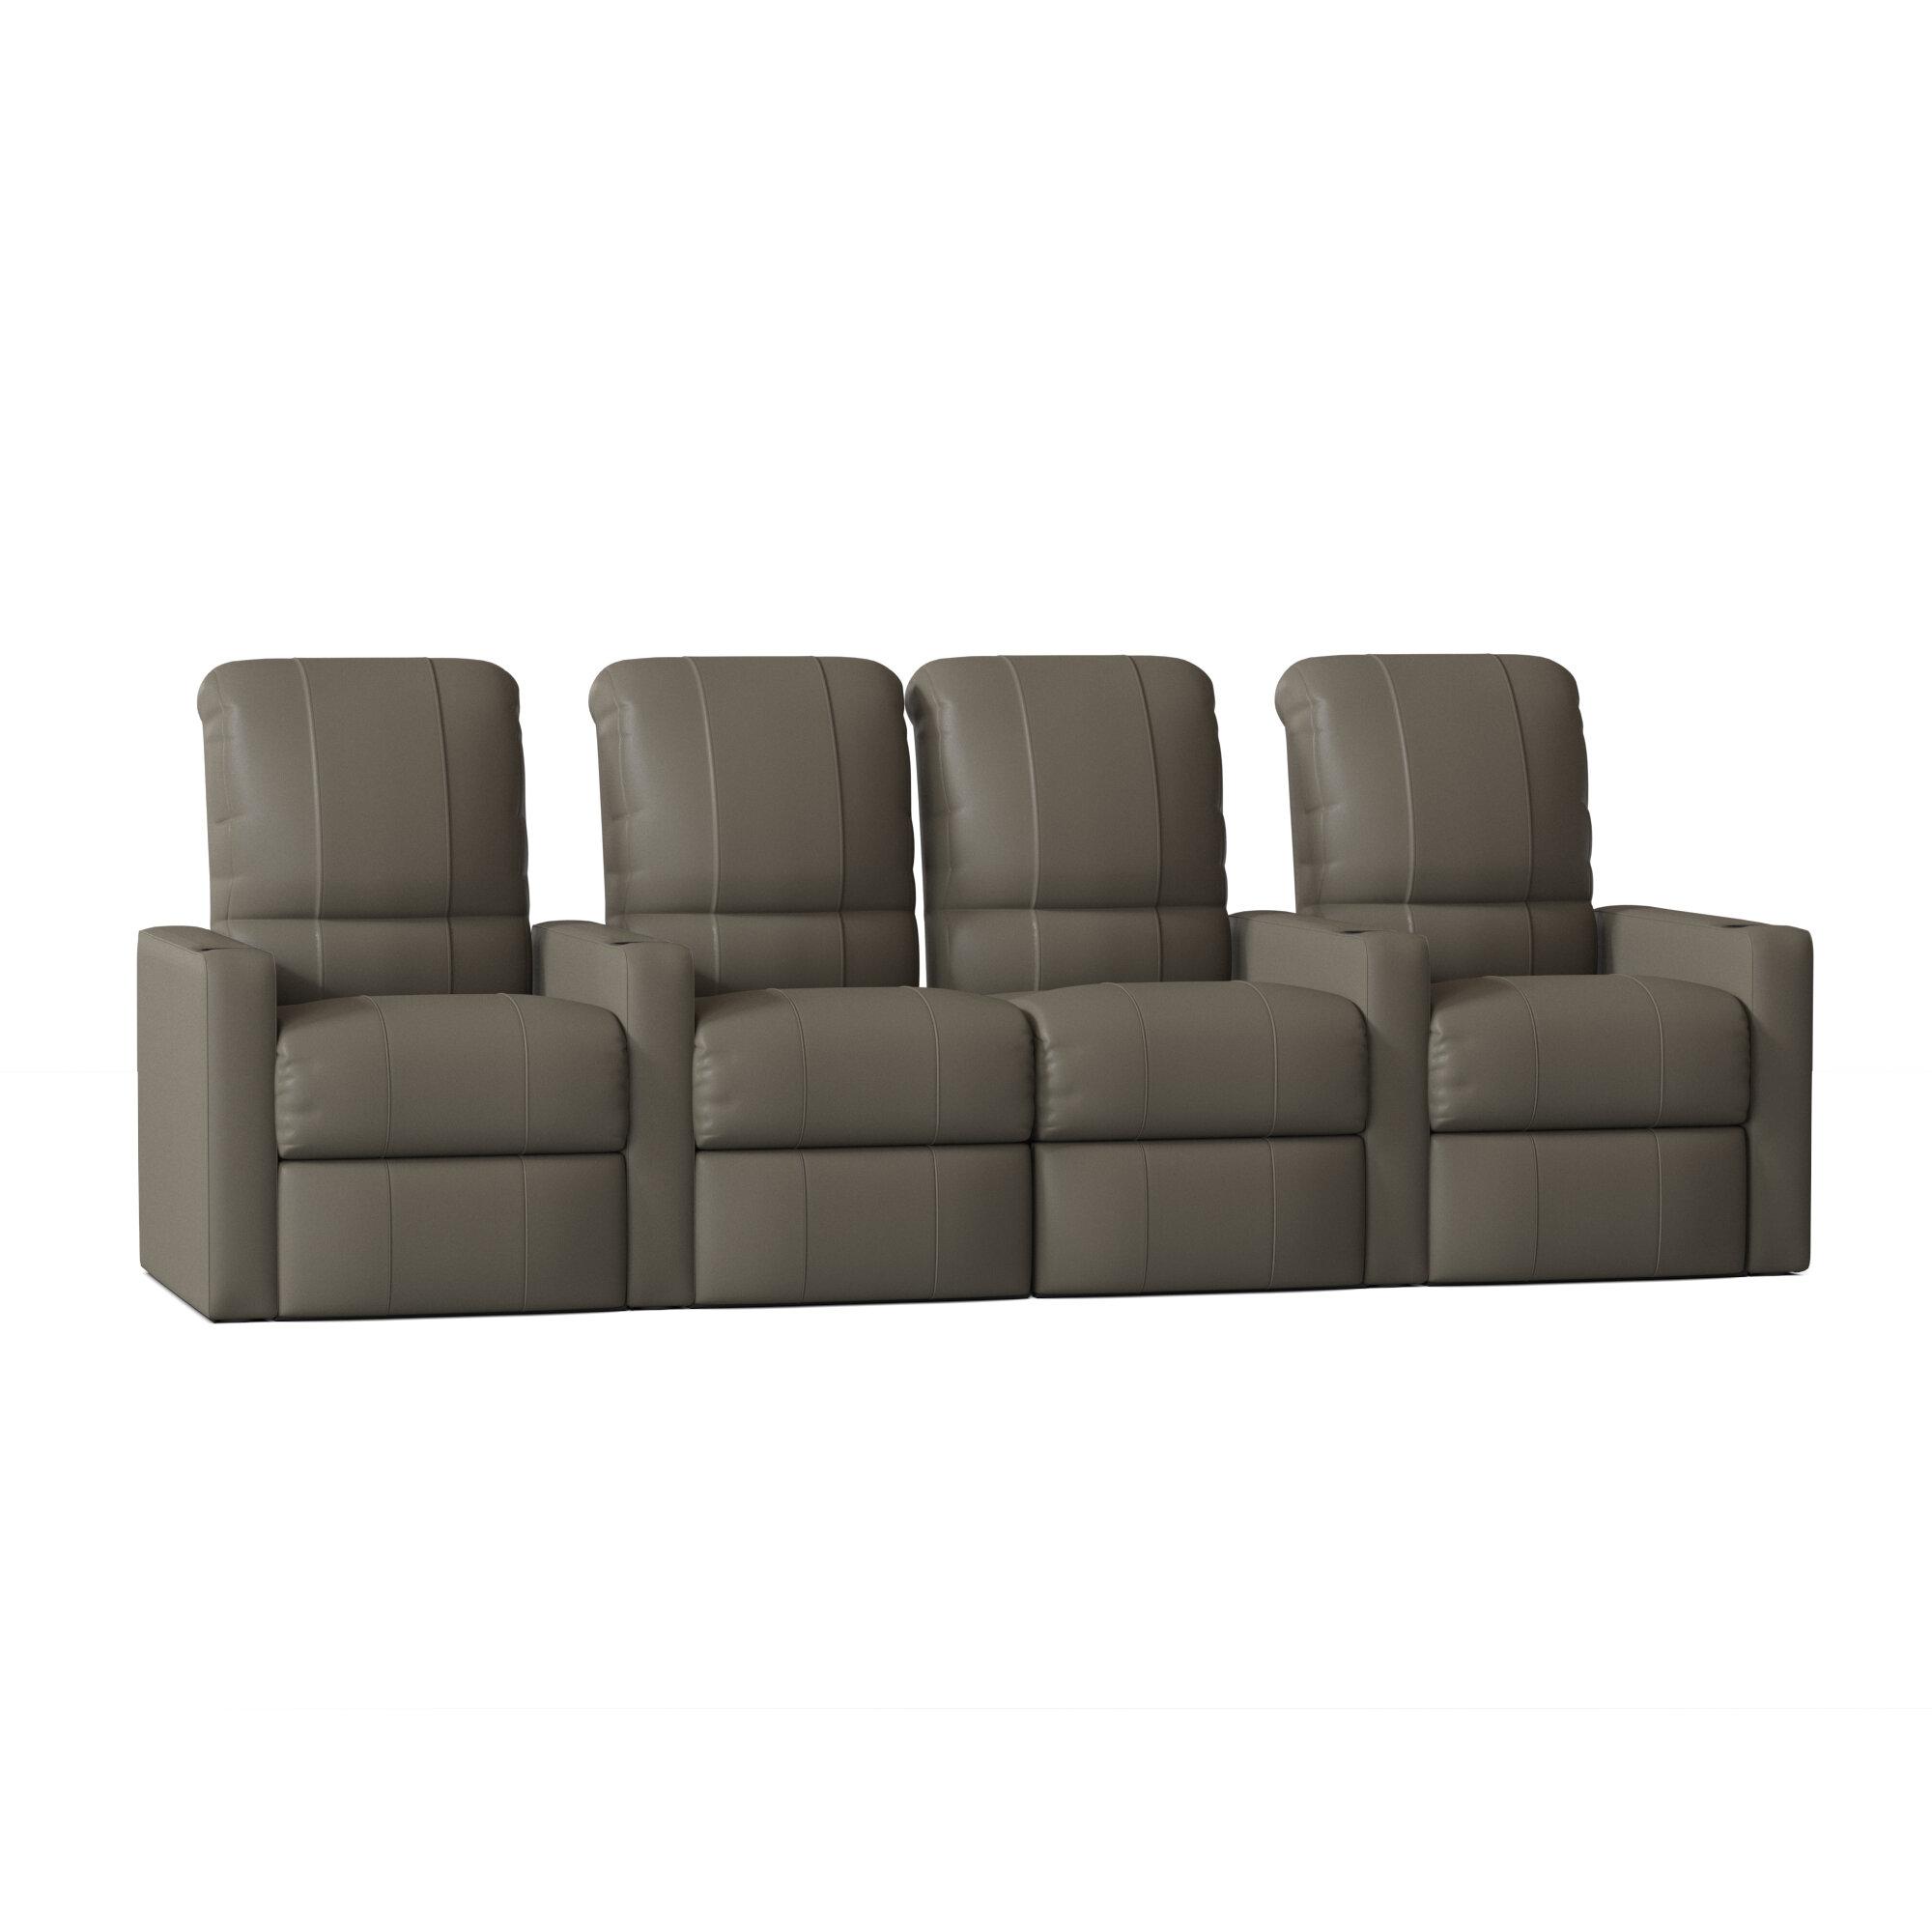 Latitude Run Home Theater Configurable Seating Row Of 4 Wayfair